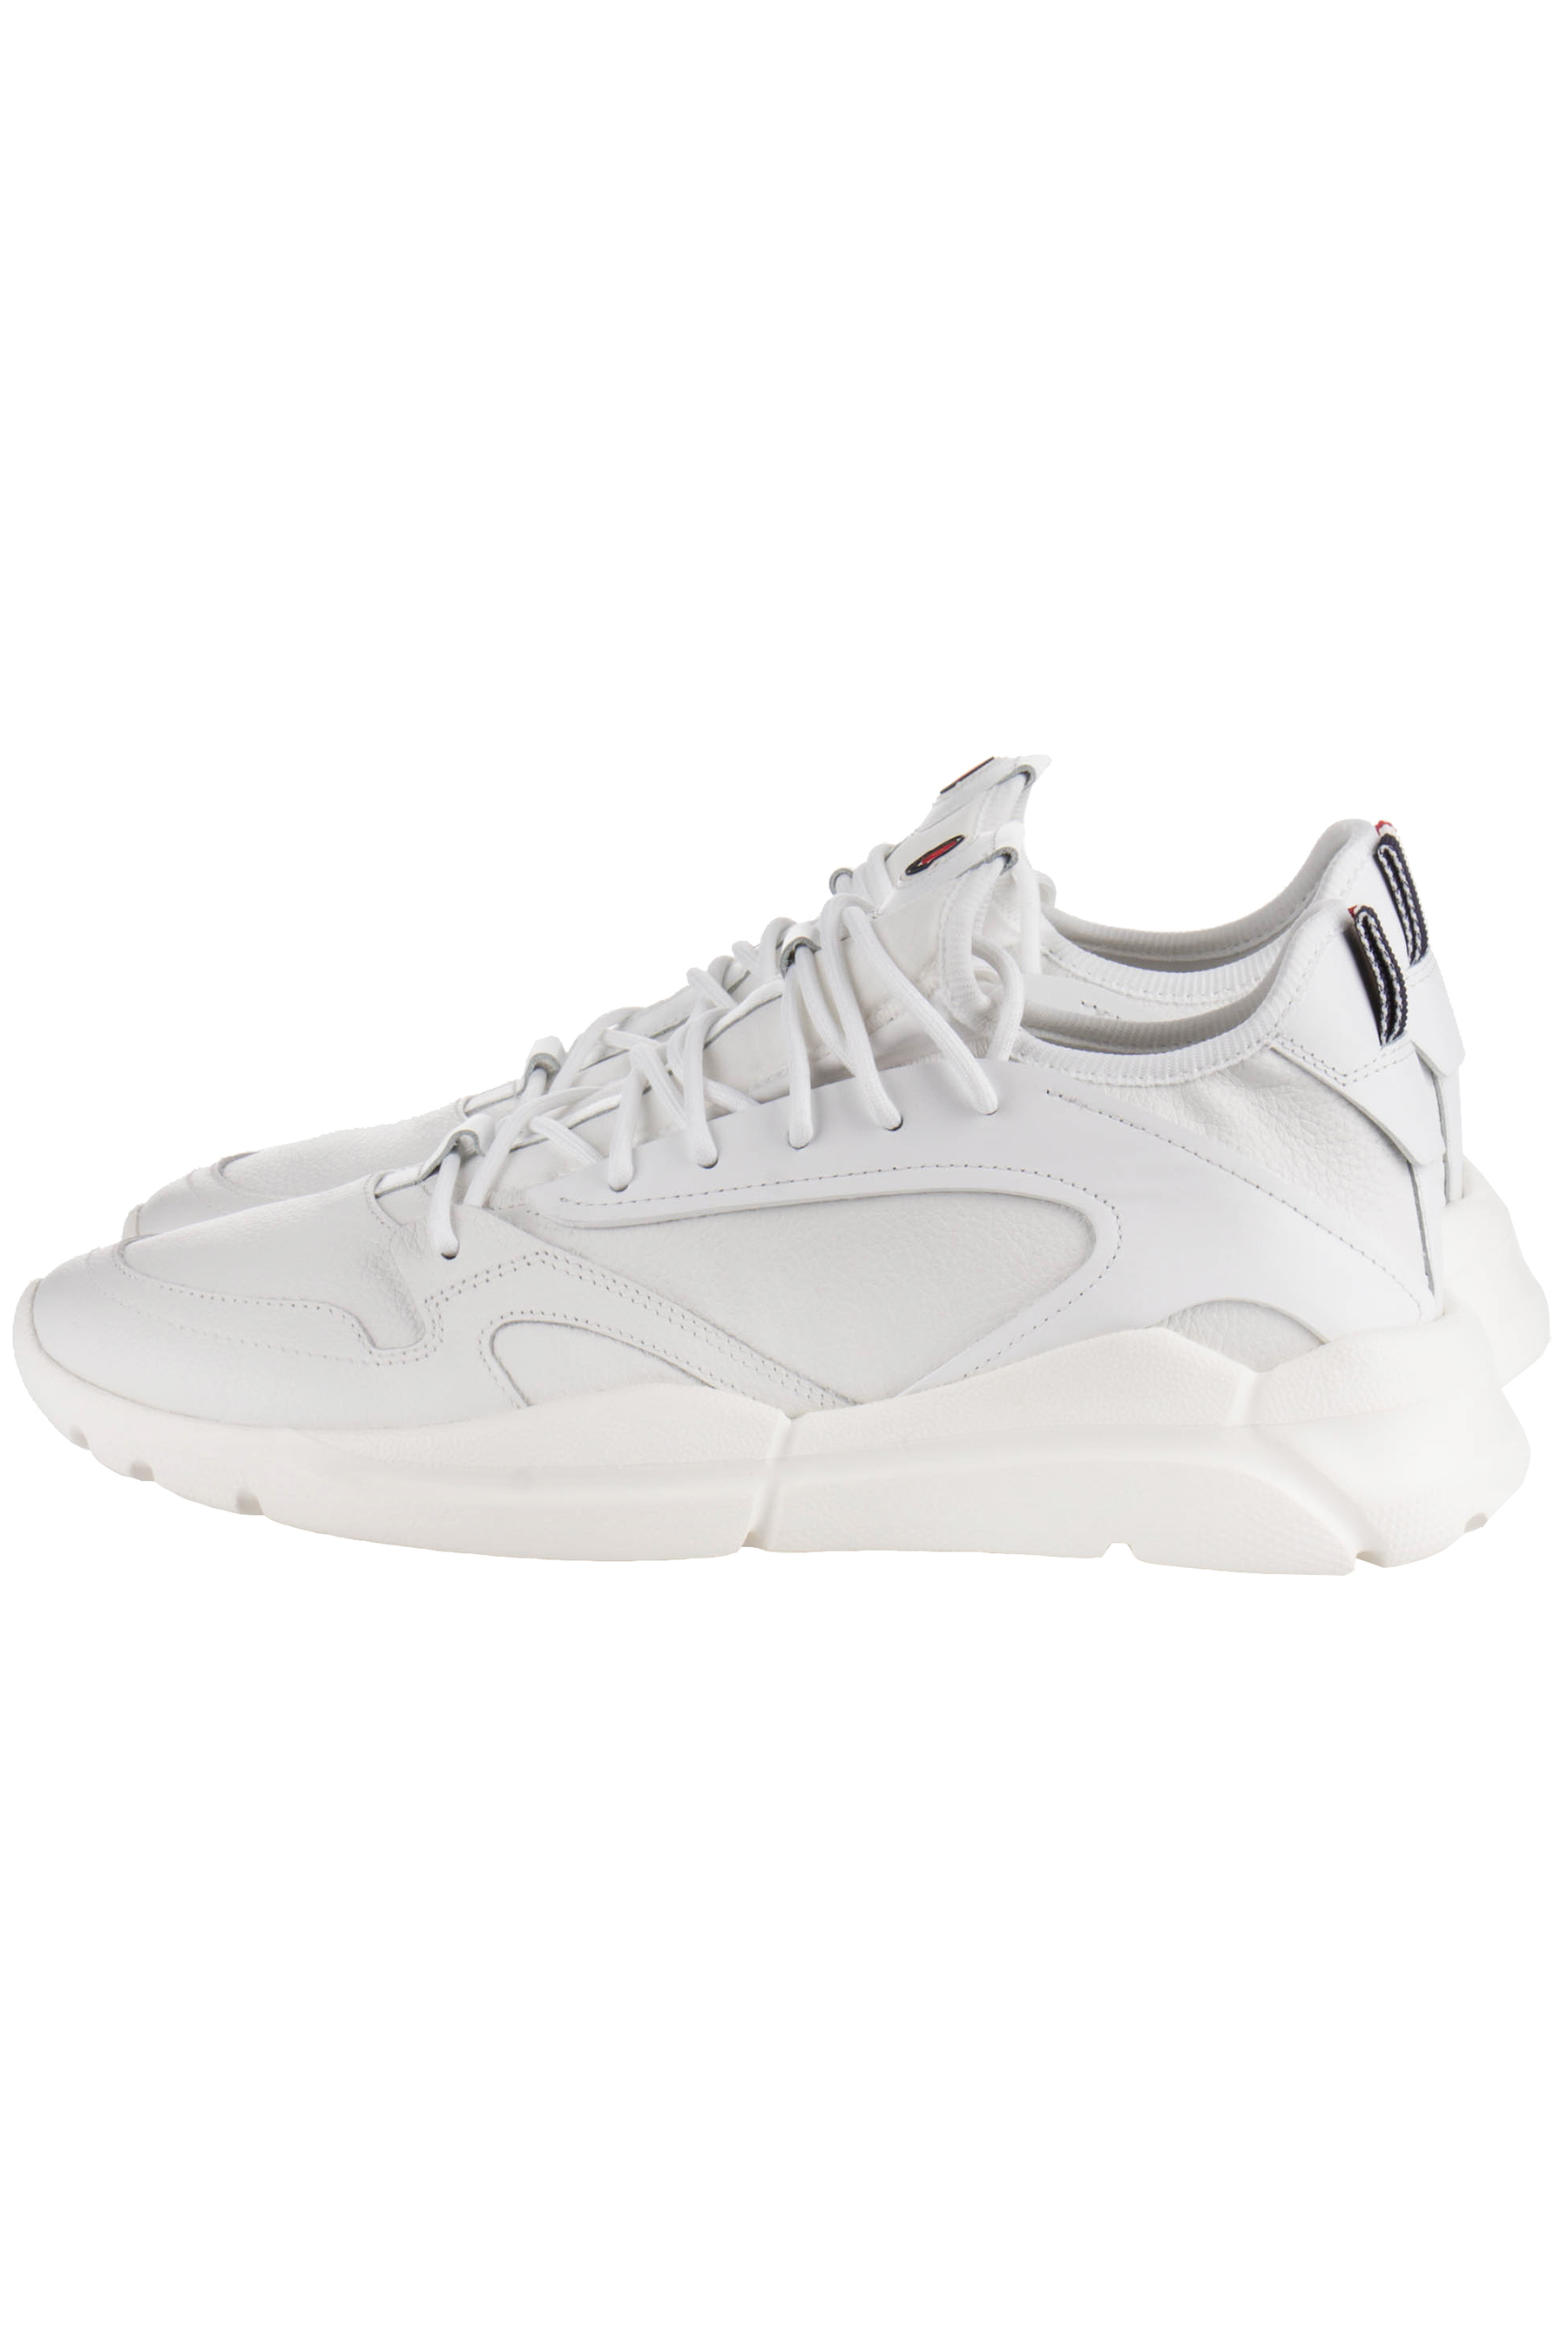 MONCLER Sneakers Anakin | Sneakers